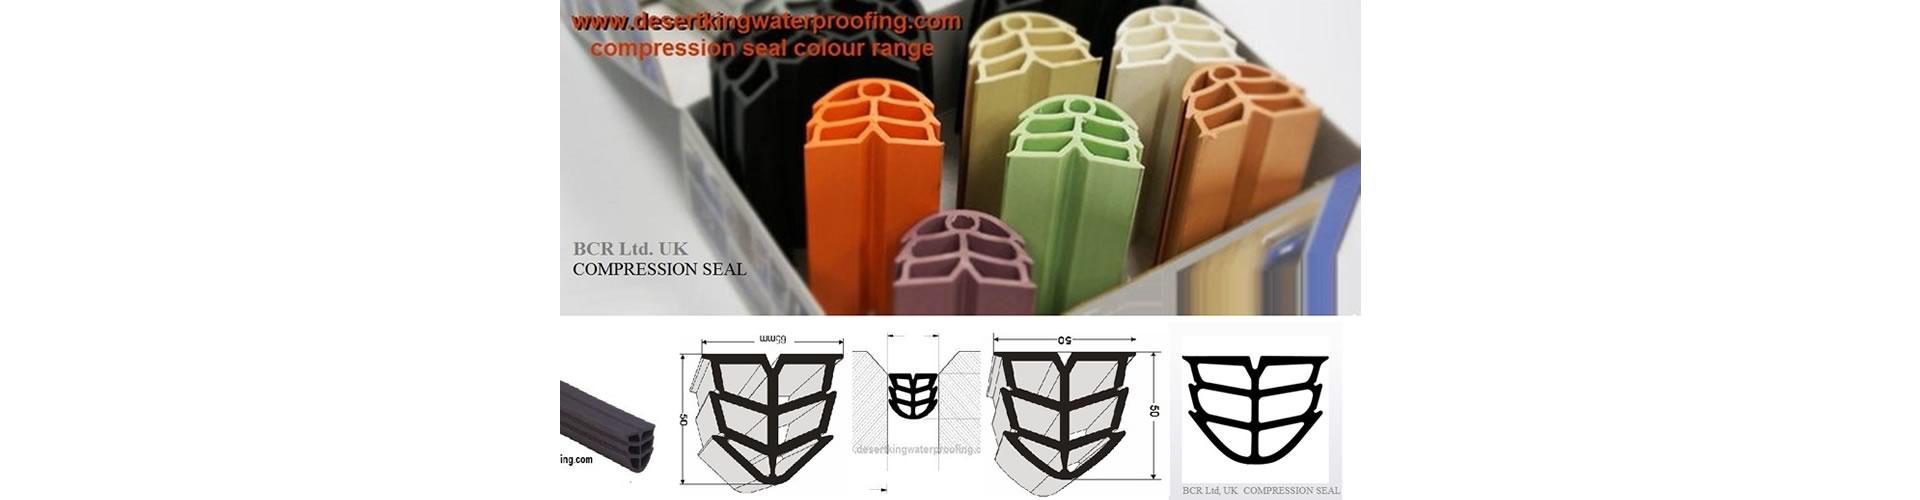 BCR Compression Seal Cover